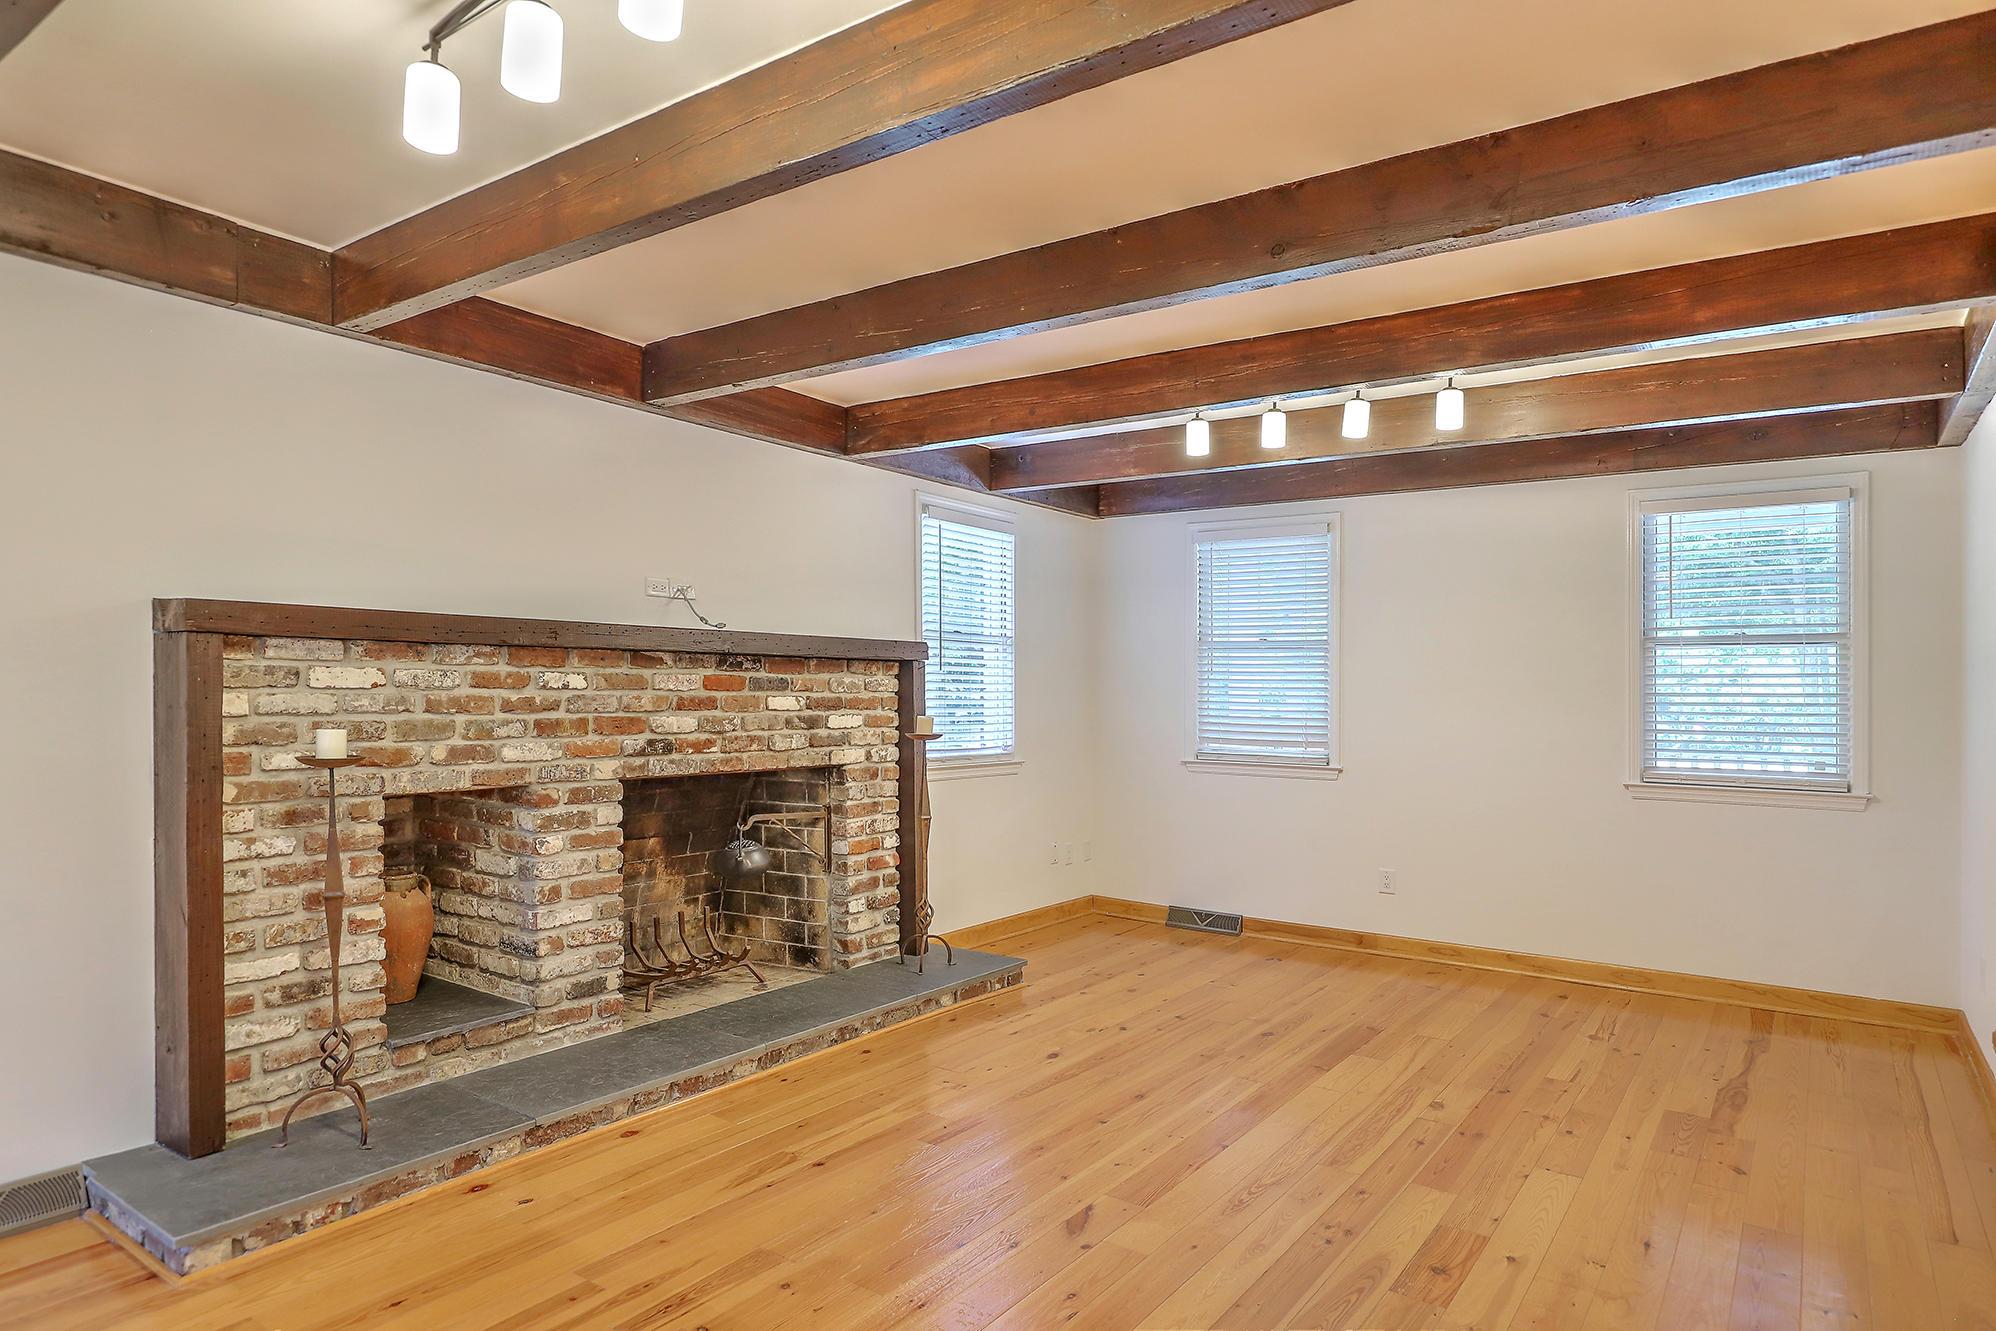 Edgewater Park Homes For Sale - 1413 Edsent, Charleston, SC - 8